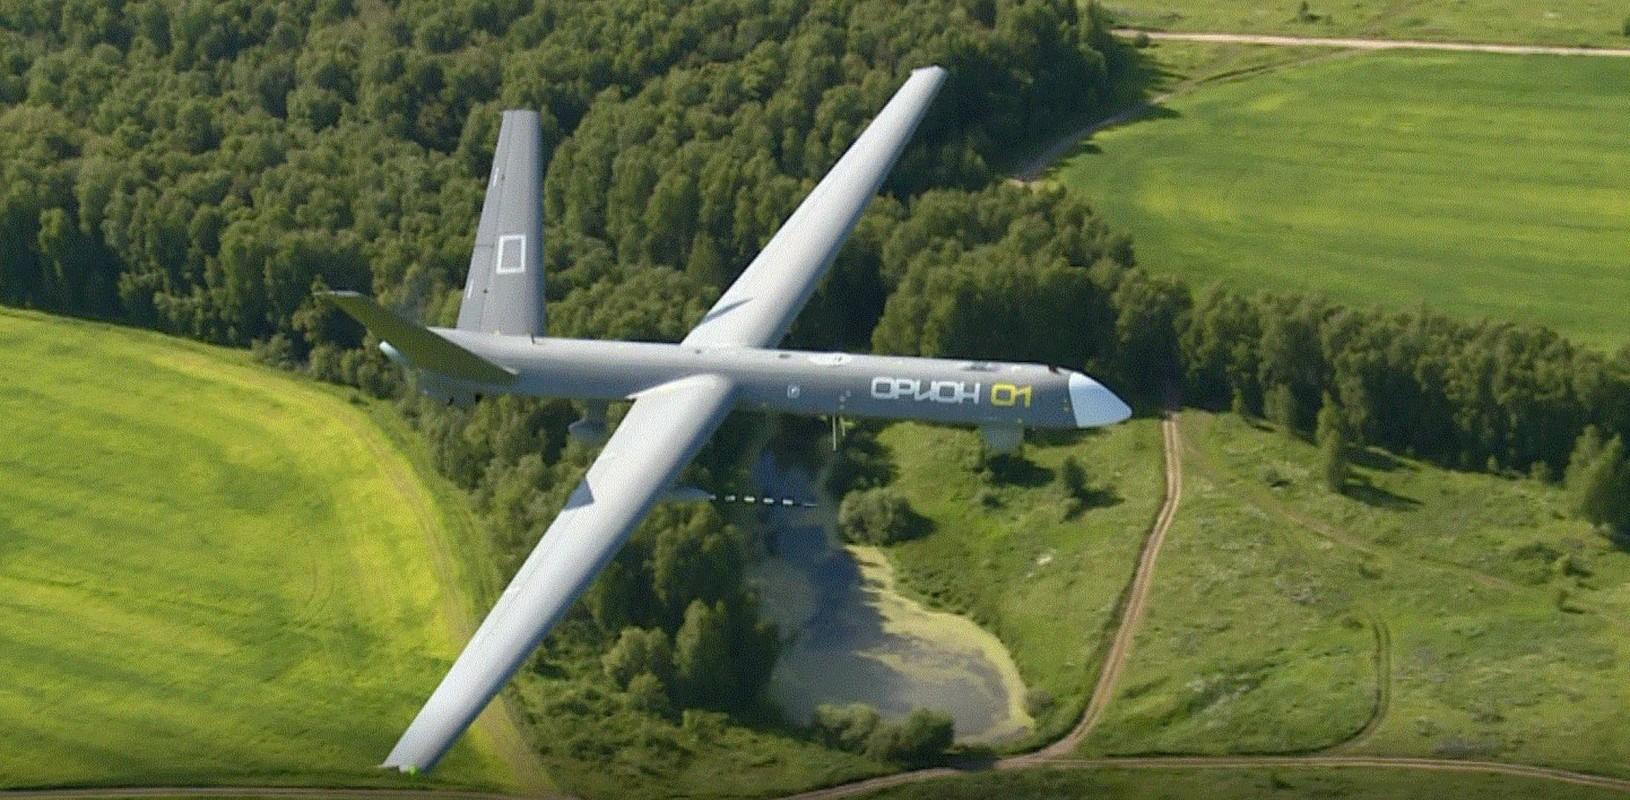 Nga lan dau khoe UAV Orion mang theo vu khi khung-Hinh-7